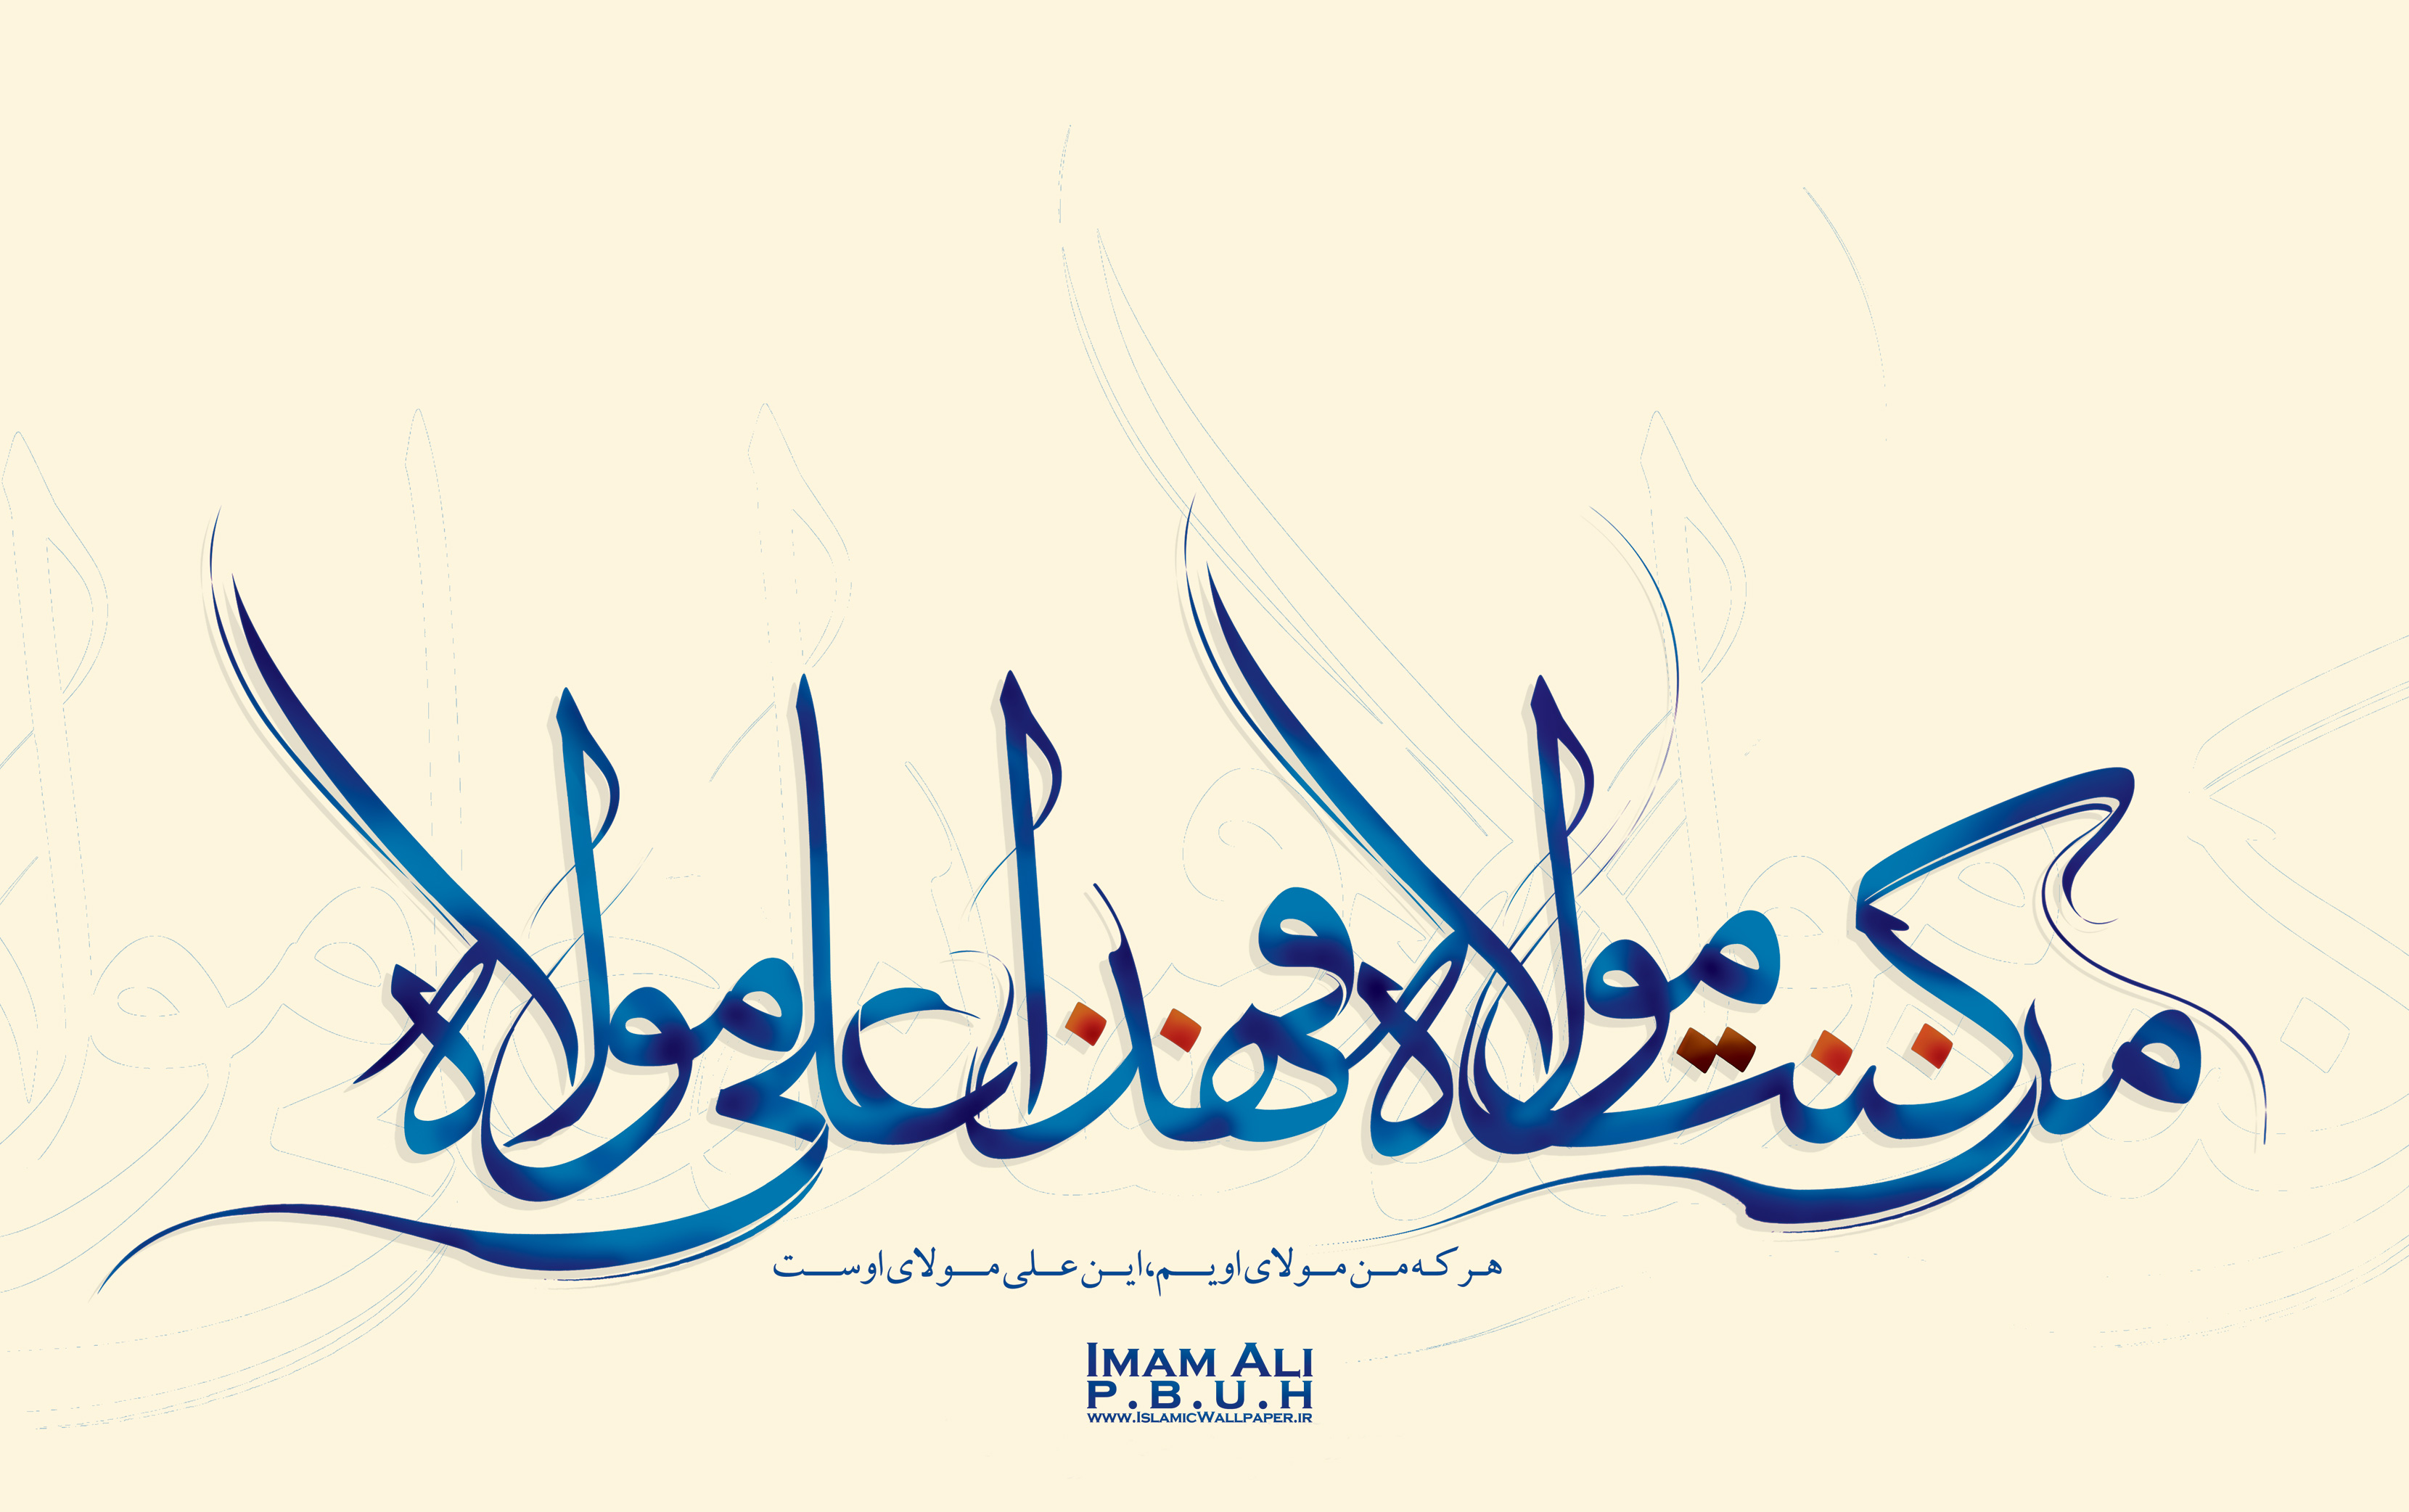 imamalipbuhbyislamicwallpaper__wwwshiapicsir_20101121_1851999636